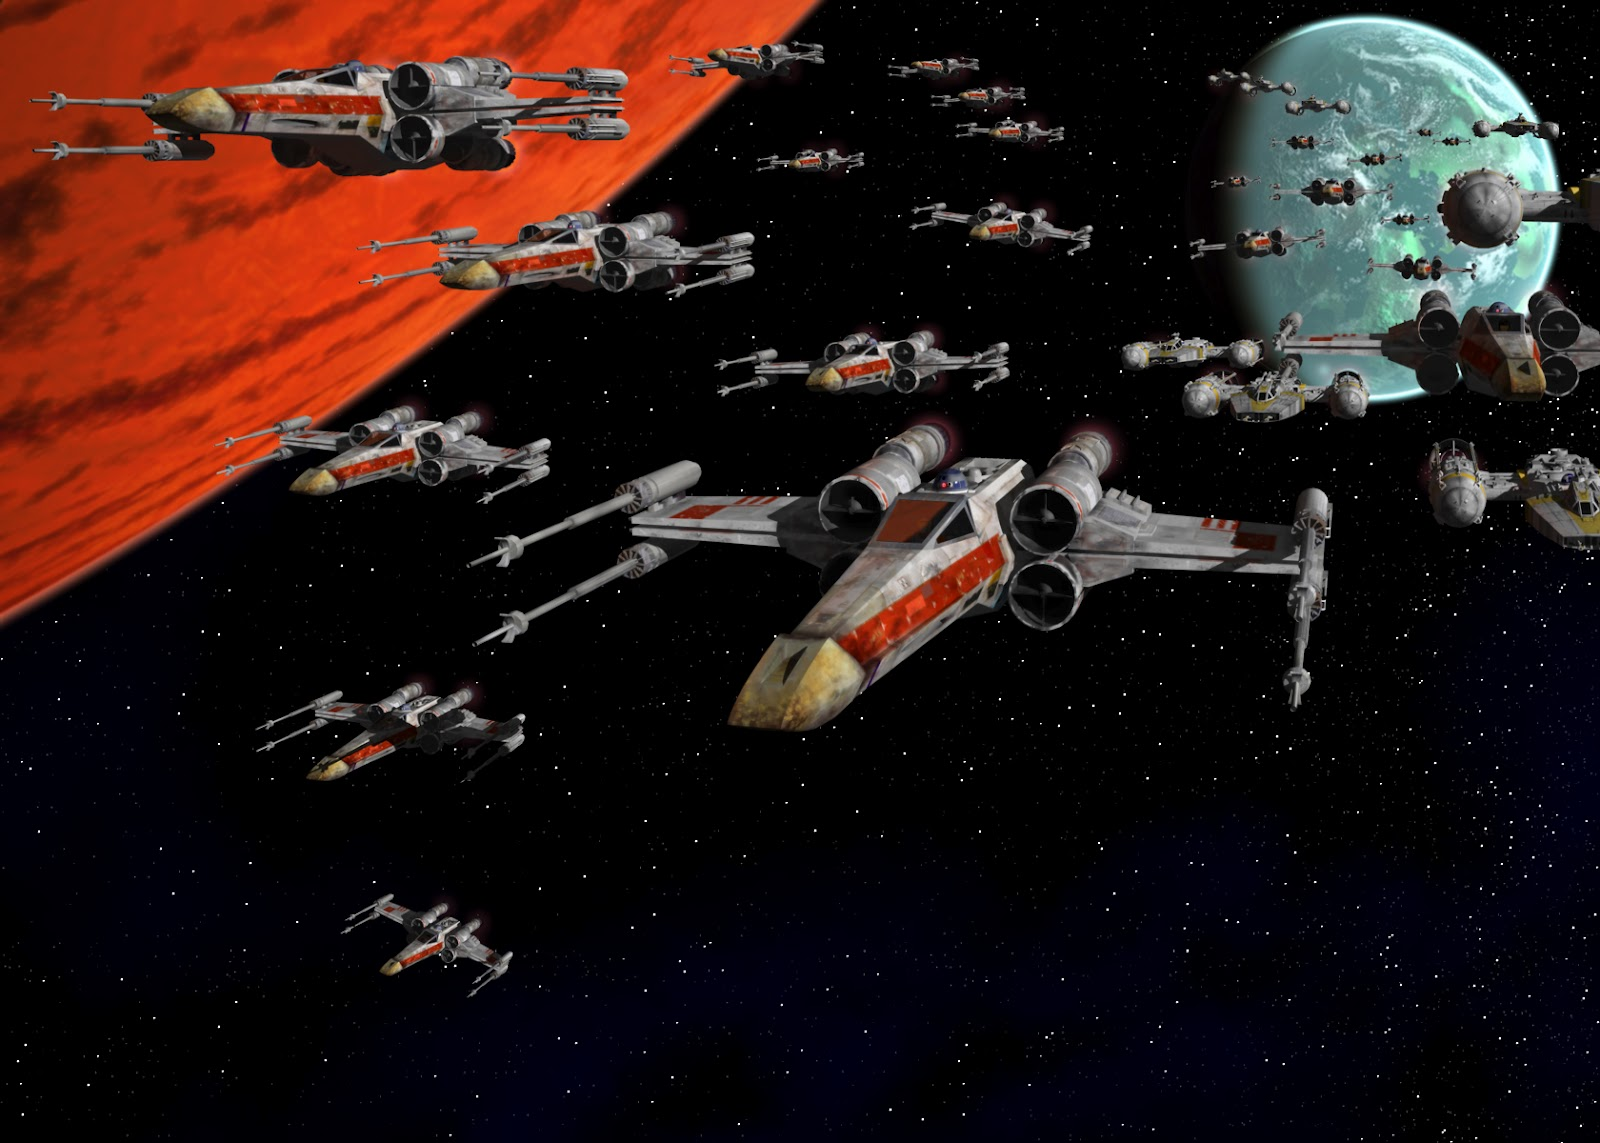 star wars wallpapers hd star wars wallpaper widescreen star wars 3 1600x1143